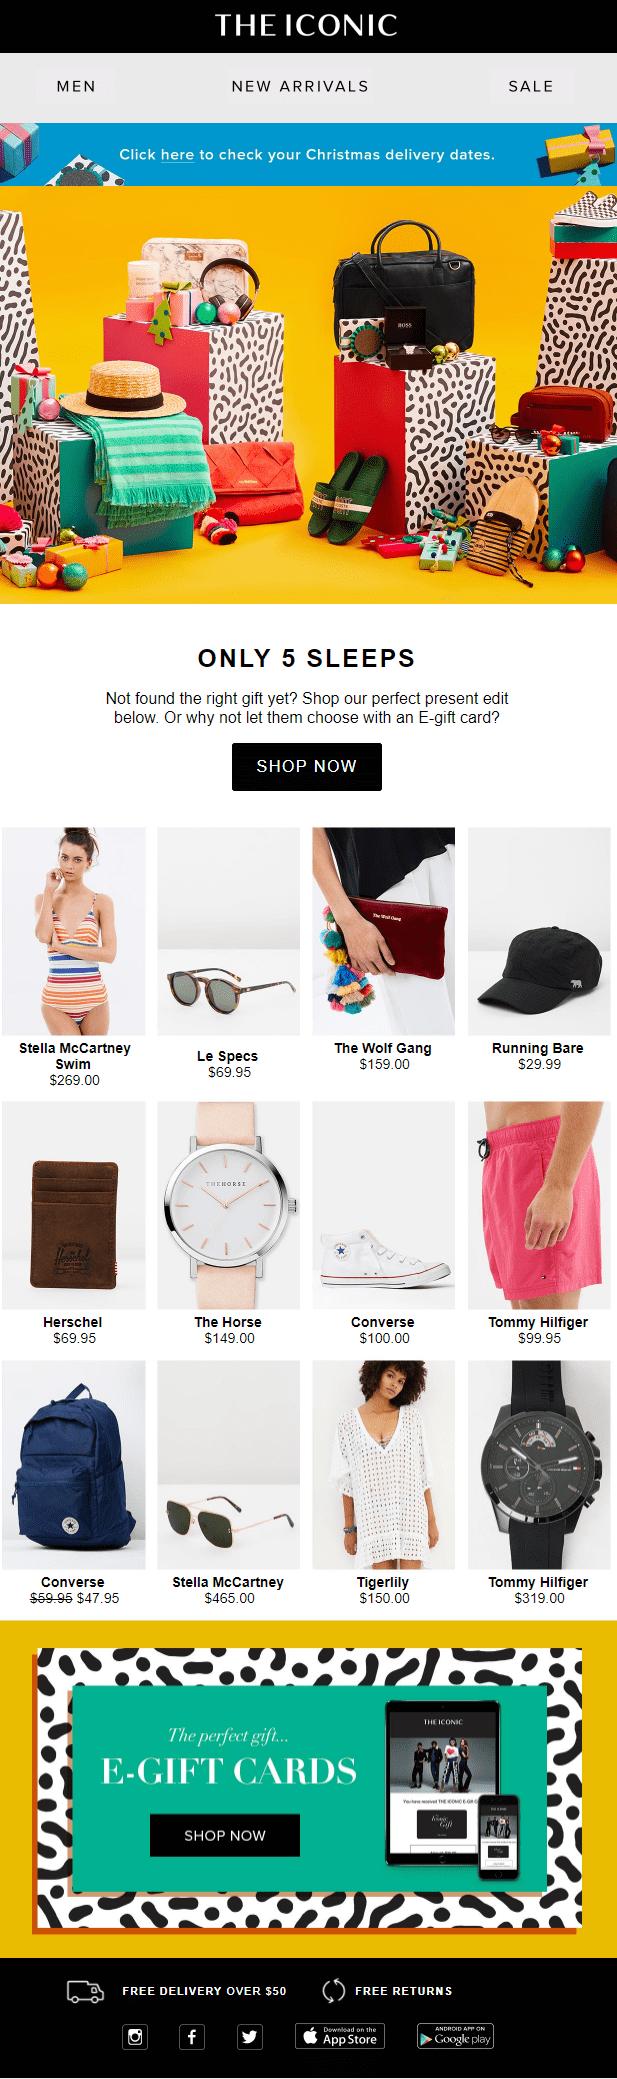 the iconic fashion email newsletter mens womens fashion segmentation christmas holiday